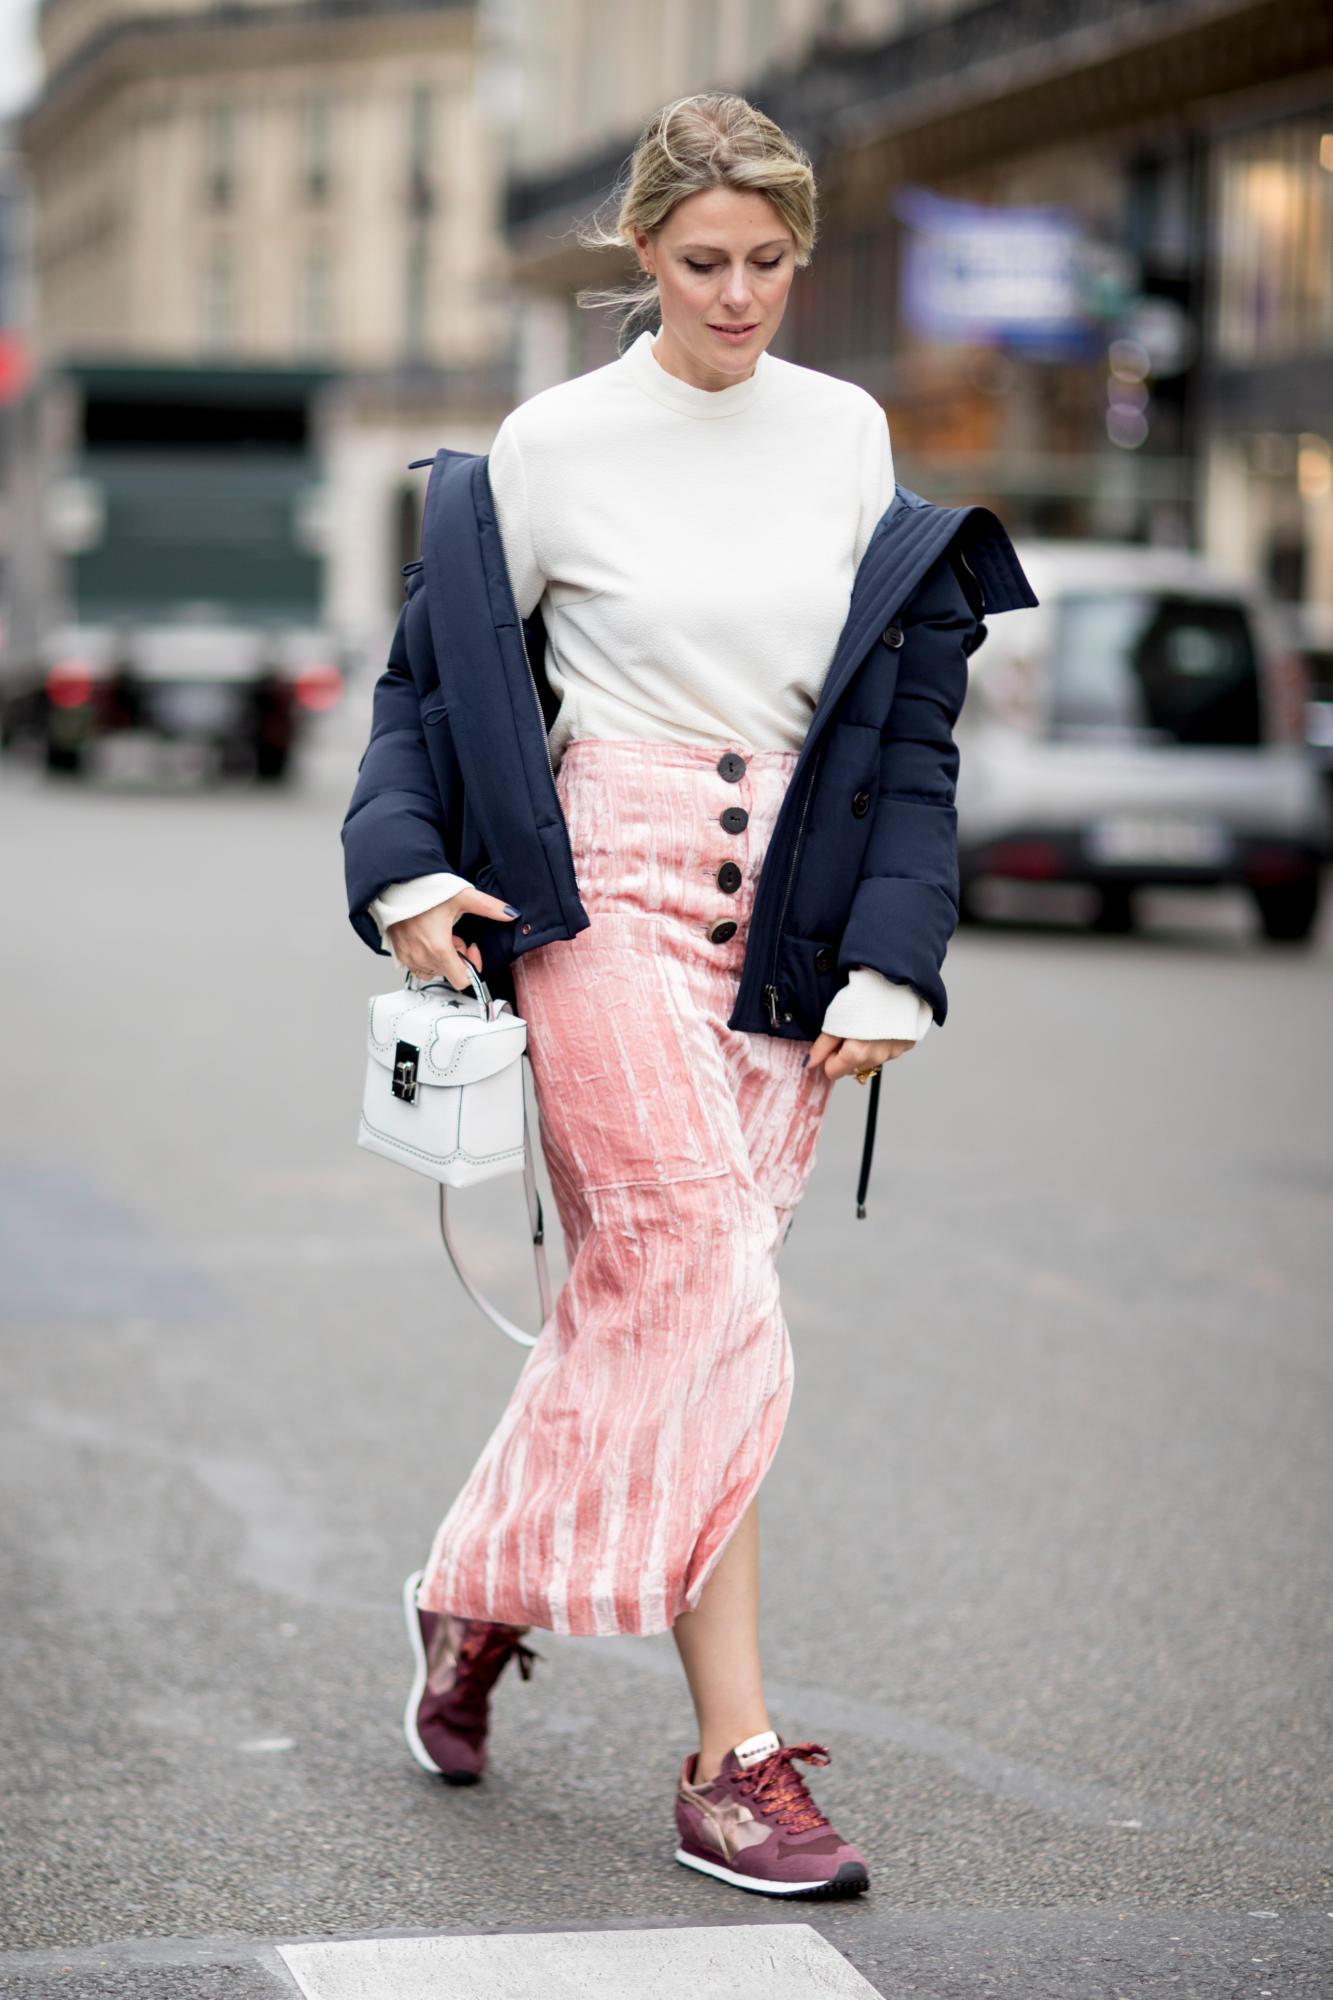 pink-light-midi-skirt-burgundy-shoe-sneakers-white-bag-white-sweater-turtleneck-black-jacket-coat-puffer-blonde-paris-fashion-week-street-style-fall-winter-lunch.jpg